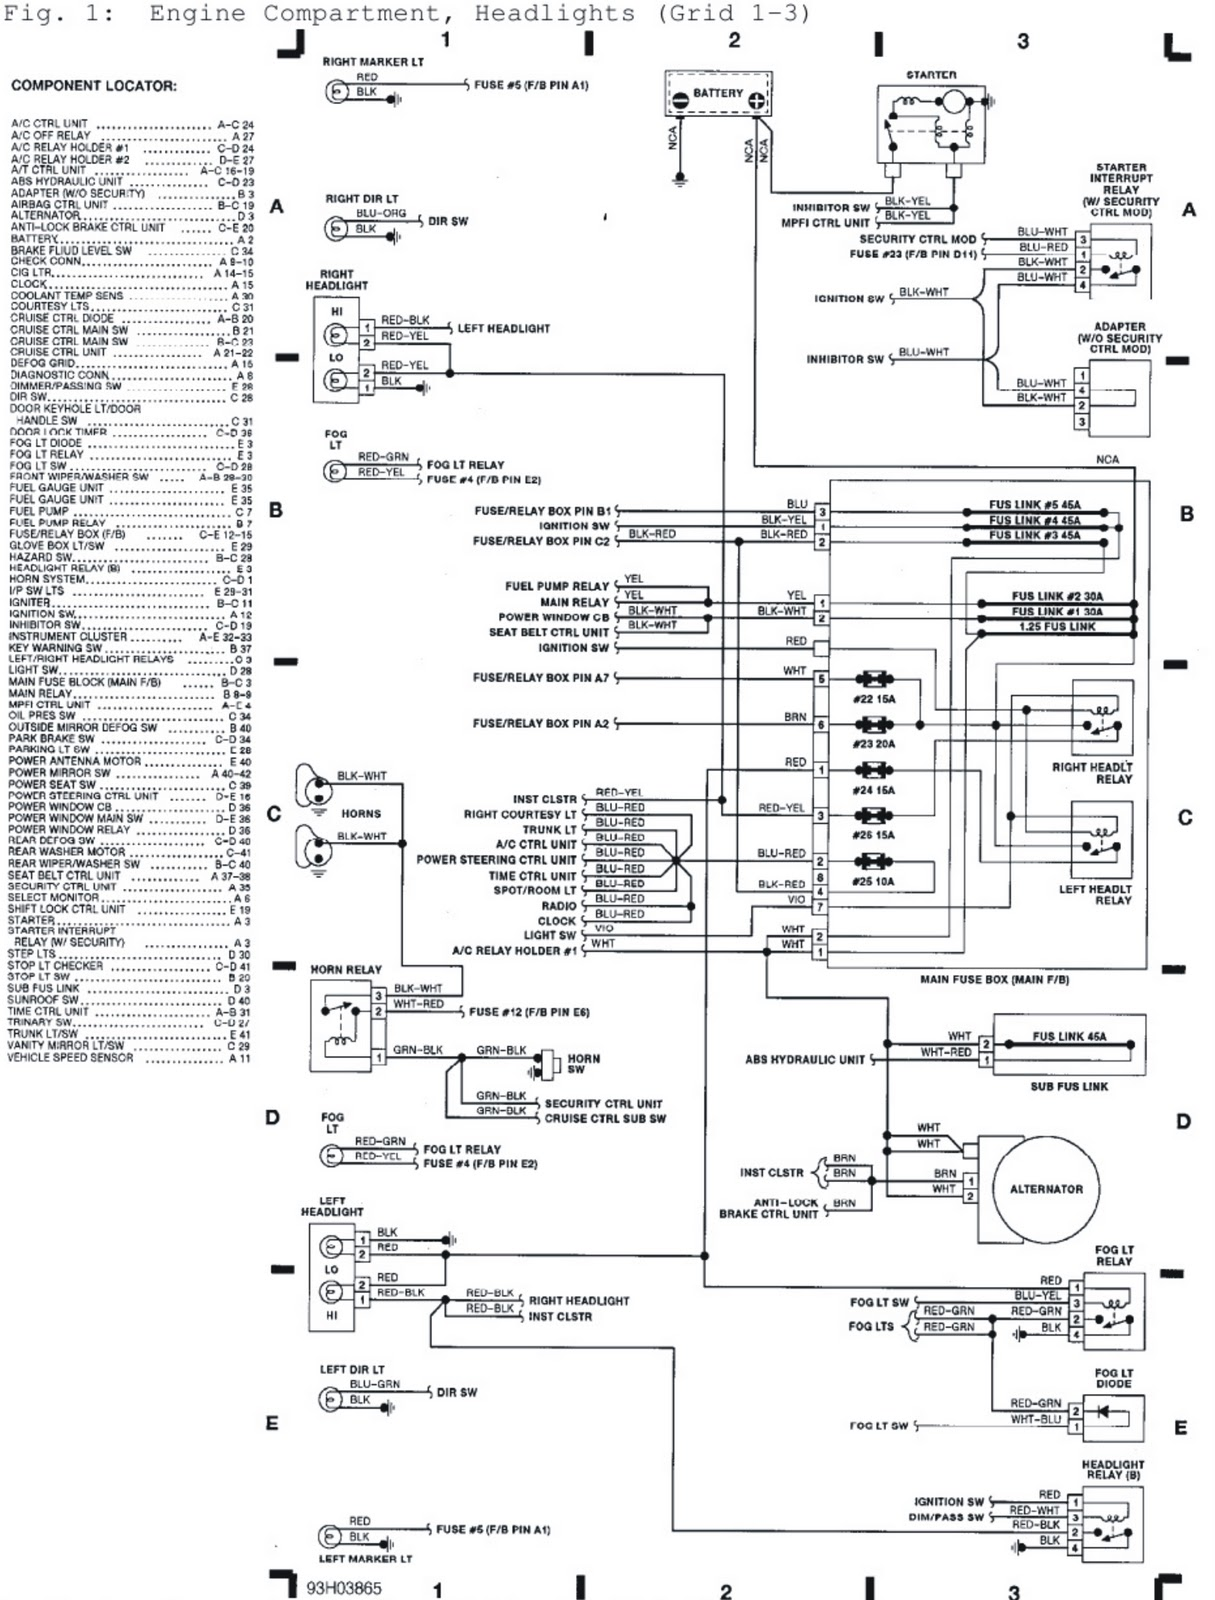 Pleasant 11 Wrx Ecu Wiring Diagram Basic Electronics Wiring Diagram Wiring Cloud Vieworaidewilluminateatxorg